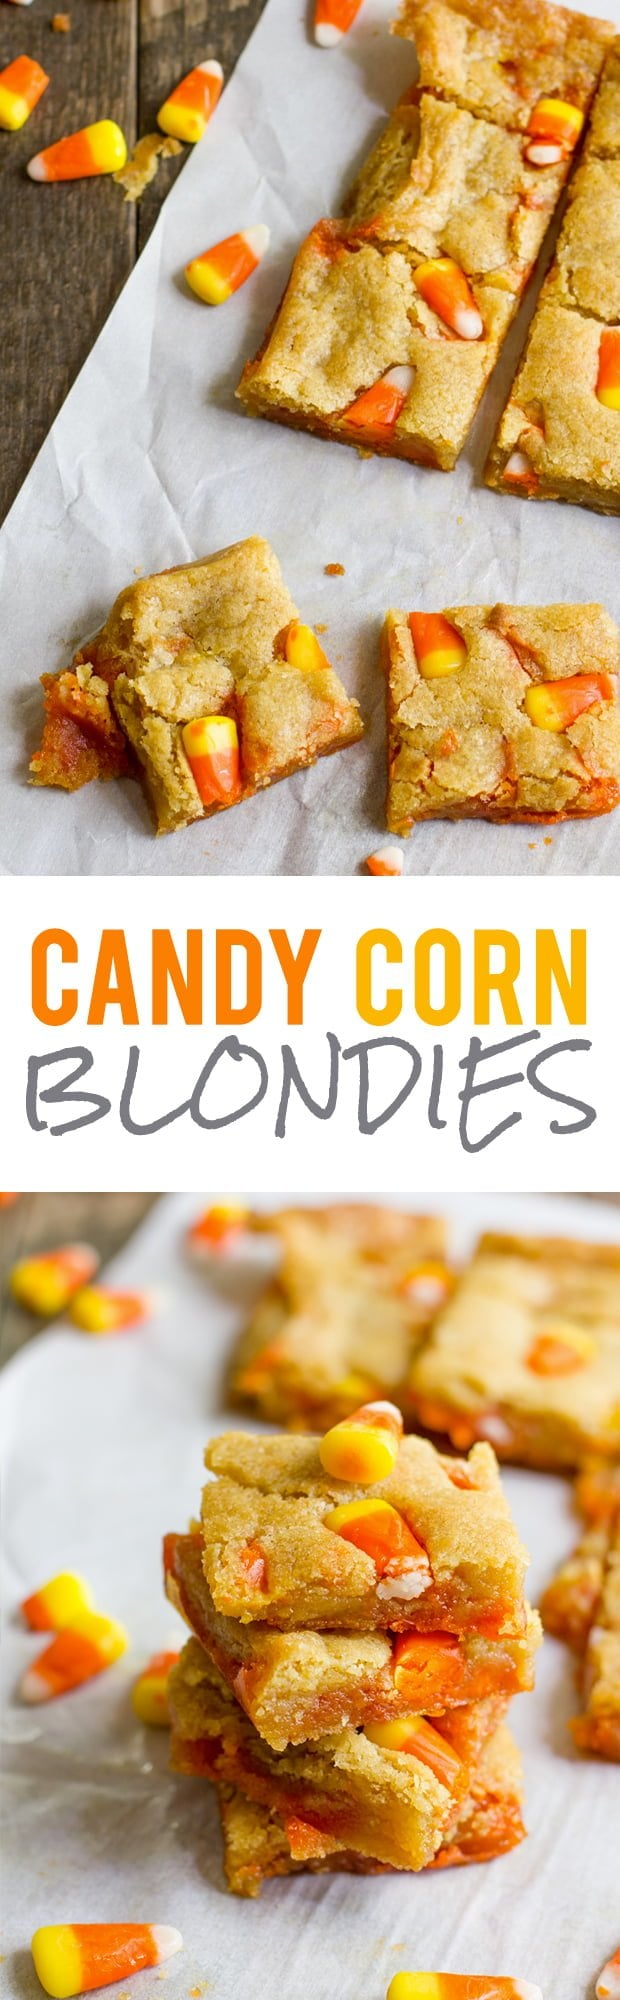 Candy Corn Blondies